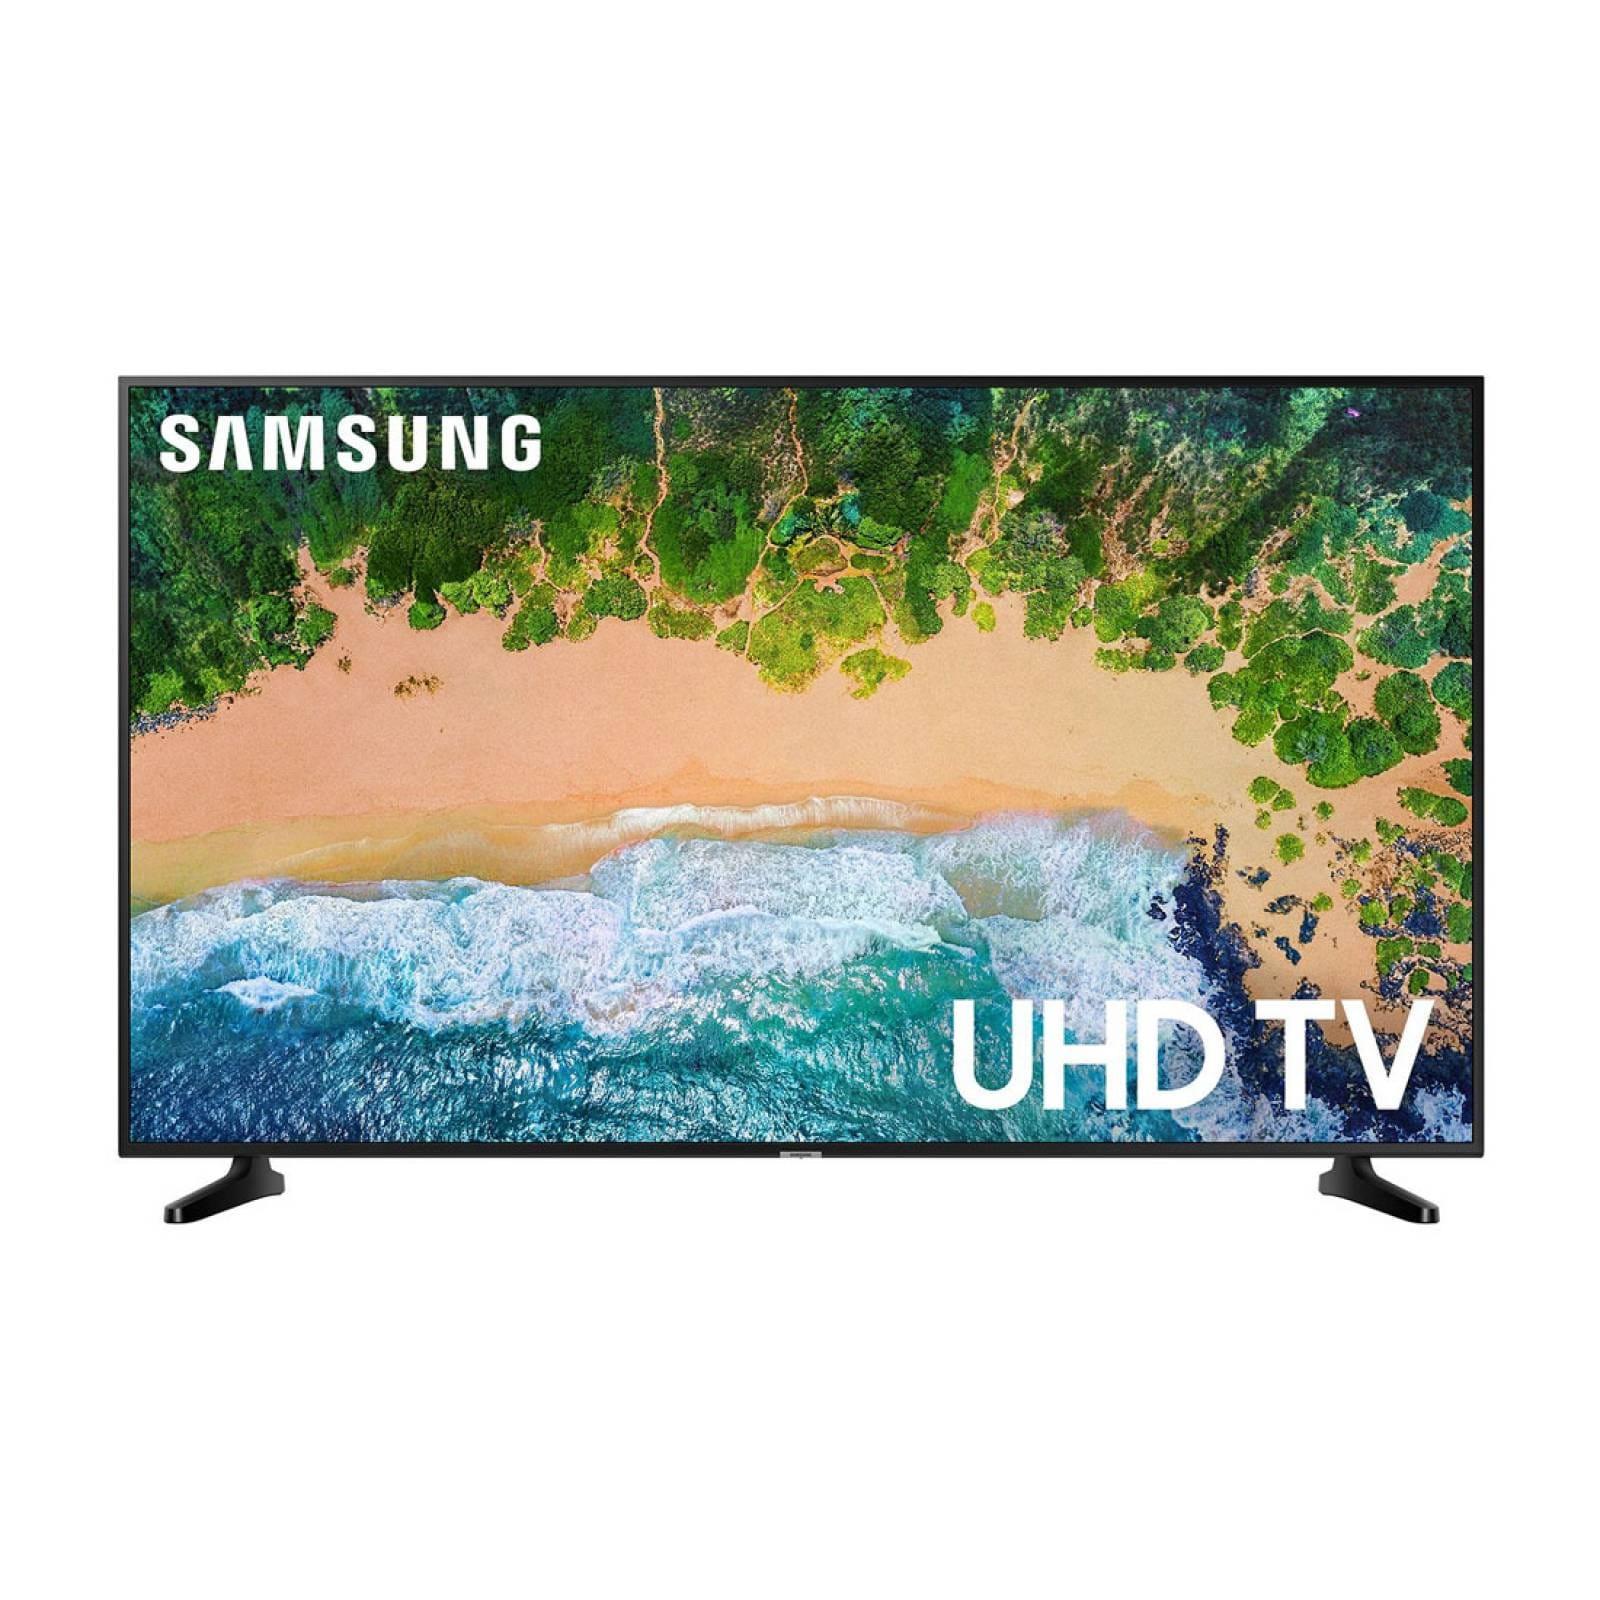 Pantalla Smart TV 50 Pulg Led 4K Web UN50NU6950FXZA Samsung